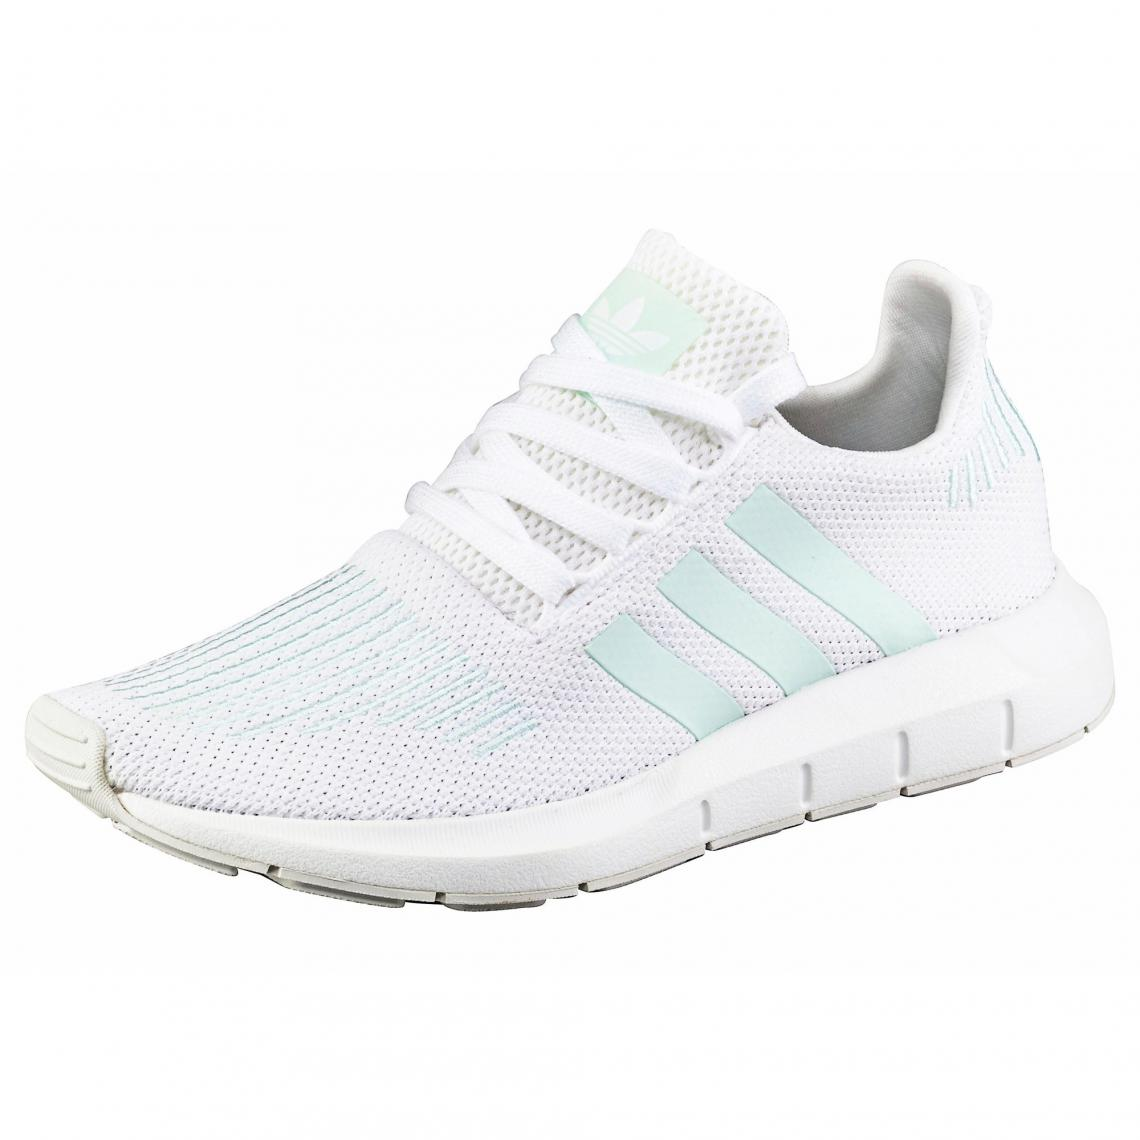 adidas Originals Swift Run chaussures running femme - Blanc - Menthe Adidas  Originals Homme 06df80f204dc